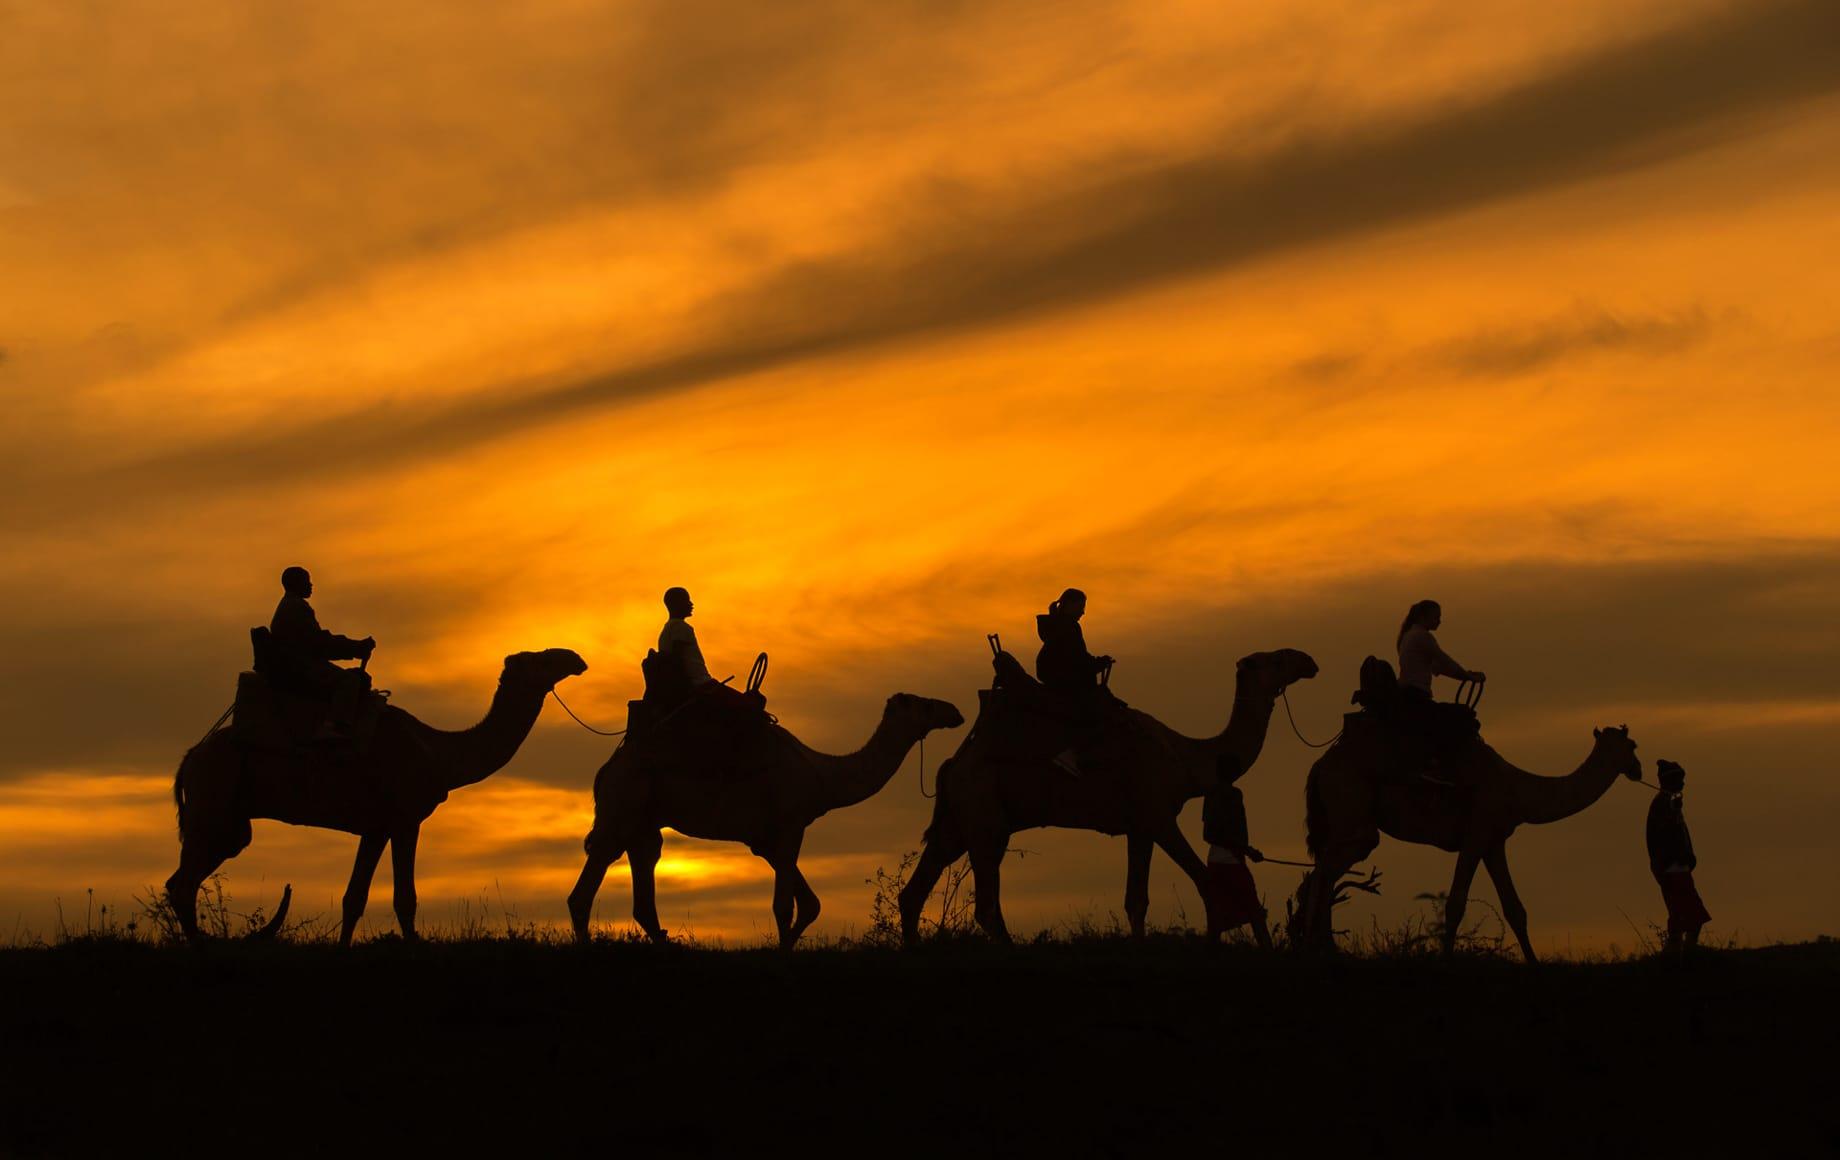 The Laikipia Plateau is a wonderful destination for camel-back safaris